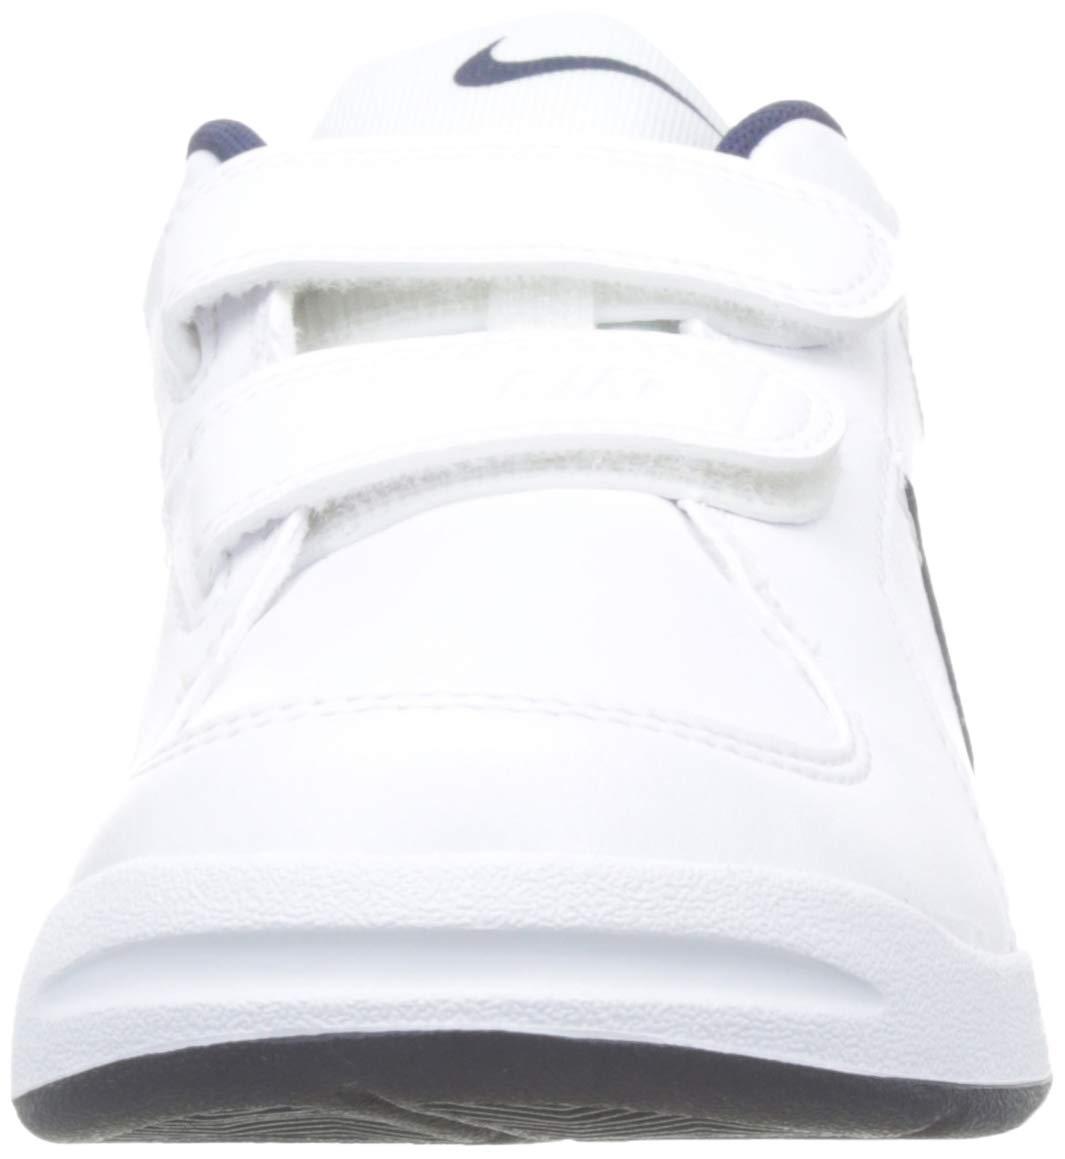 Nike Odyssey React, Scarpe da Ginnastica Basse Uomo: Amazon